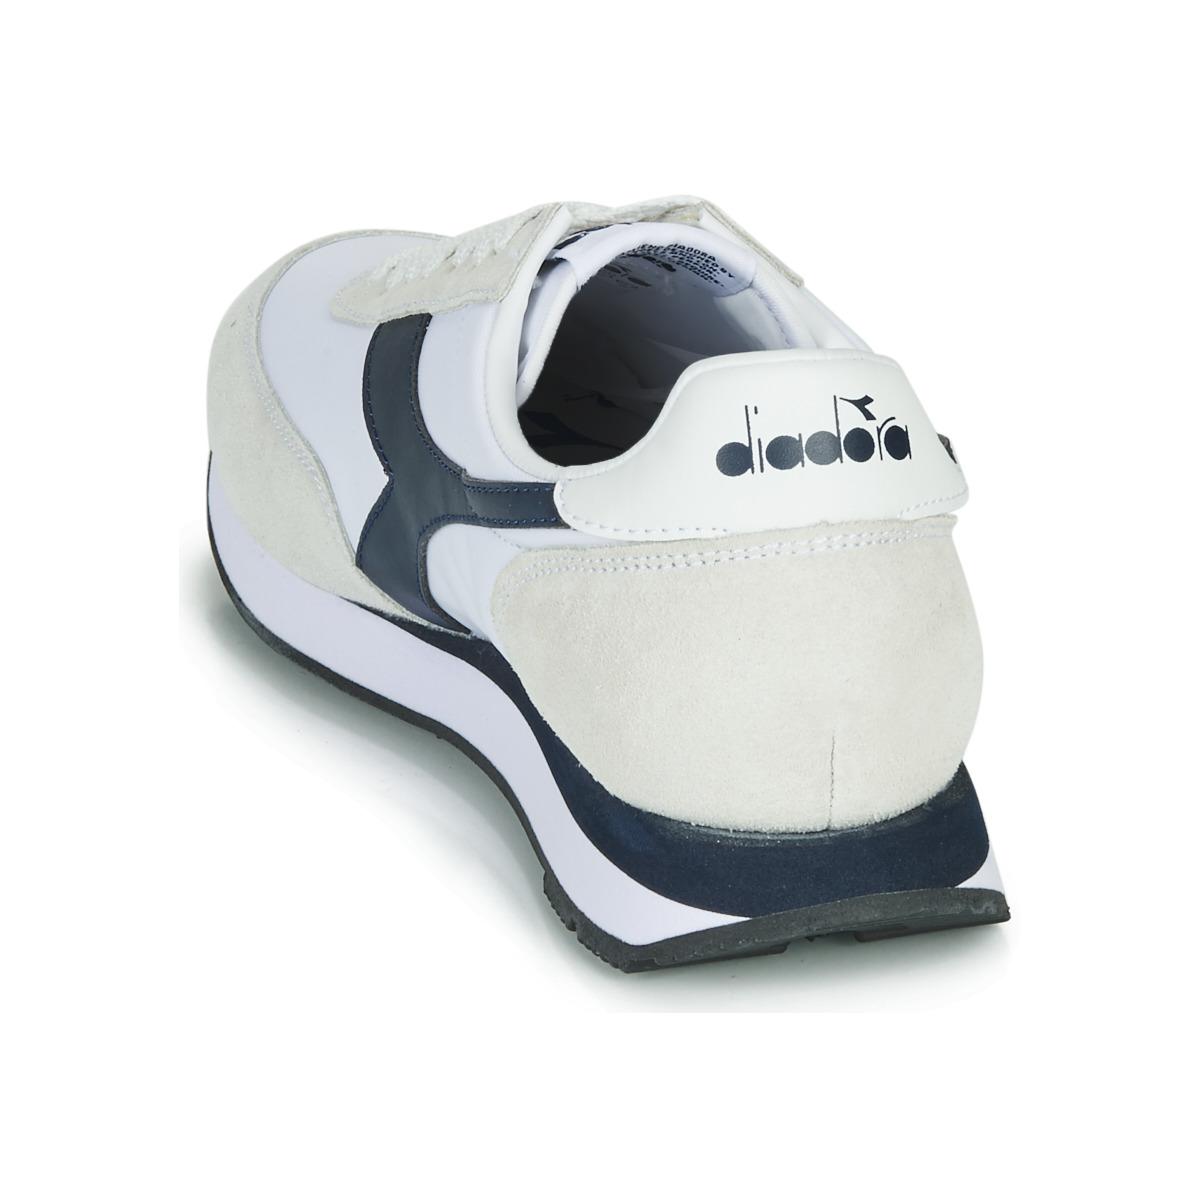 Diadora KOALA 16477089 Free Delivery OutletScarpeOnline.it